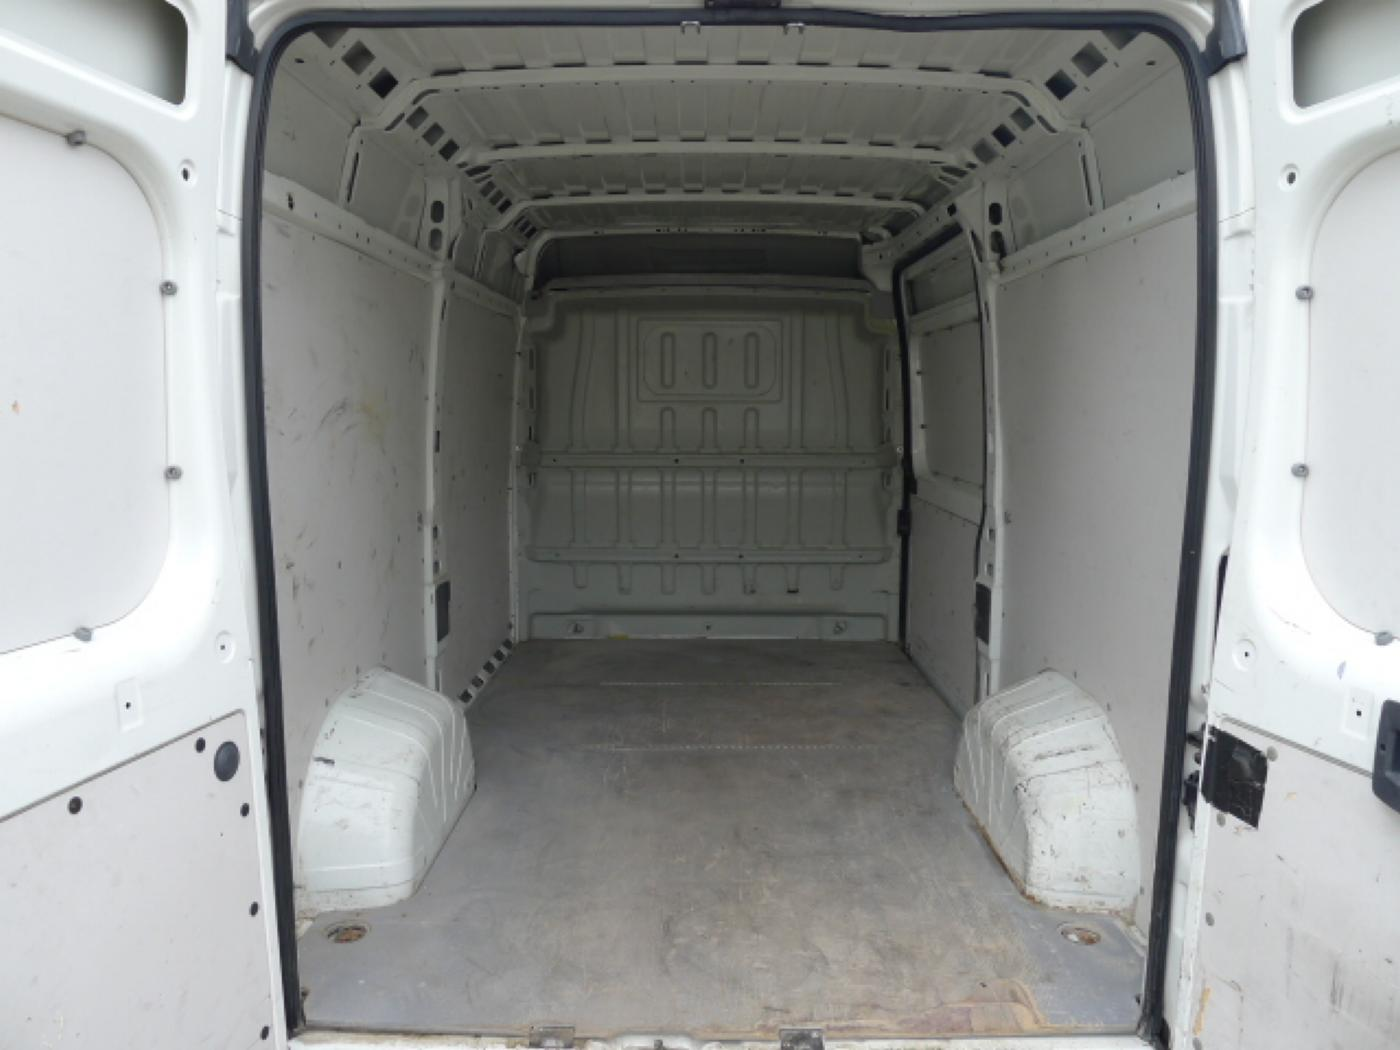 Peugeot Boxer 2.2 HDI L2H2 Klima Akce!!! Novinka - 6